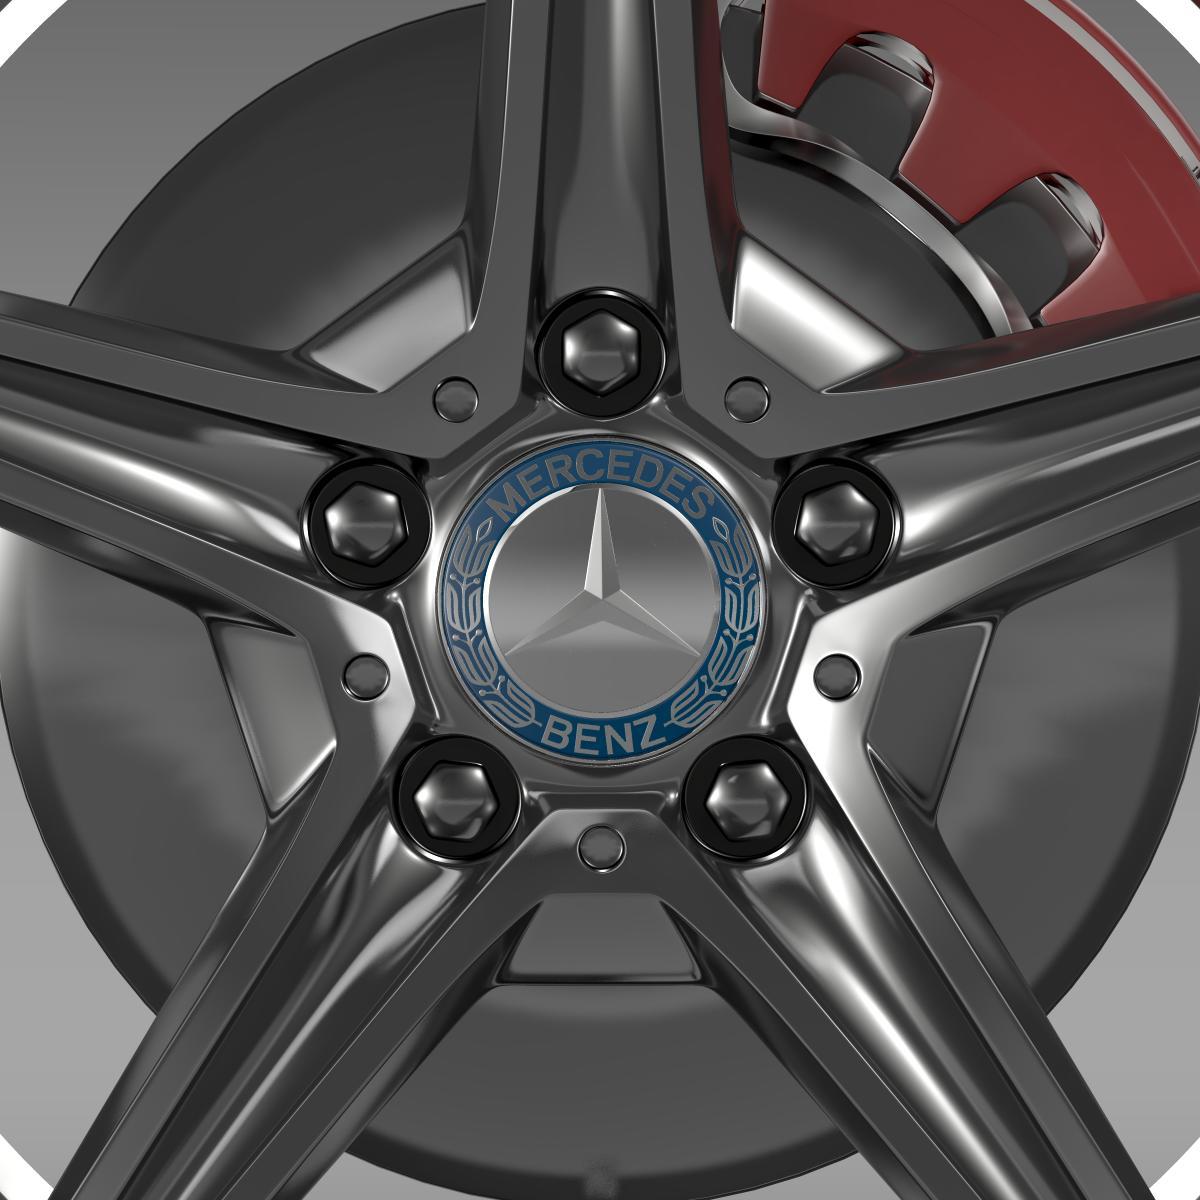 mercedes benz c 400 4matic amg line wheel 3d model 3ds max fbx c4d lwo ma mb hrc xsi obj 210788